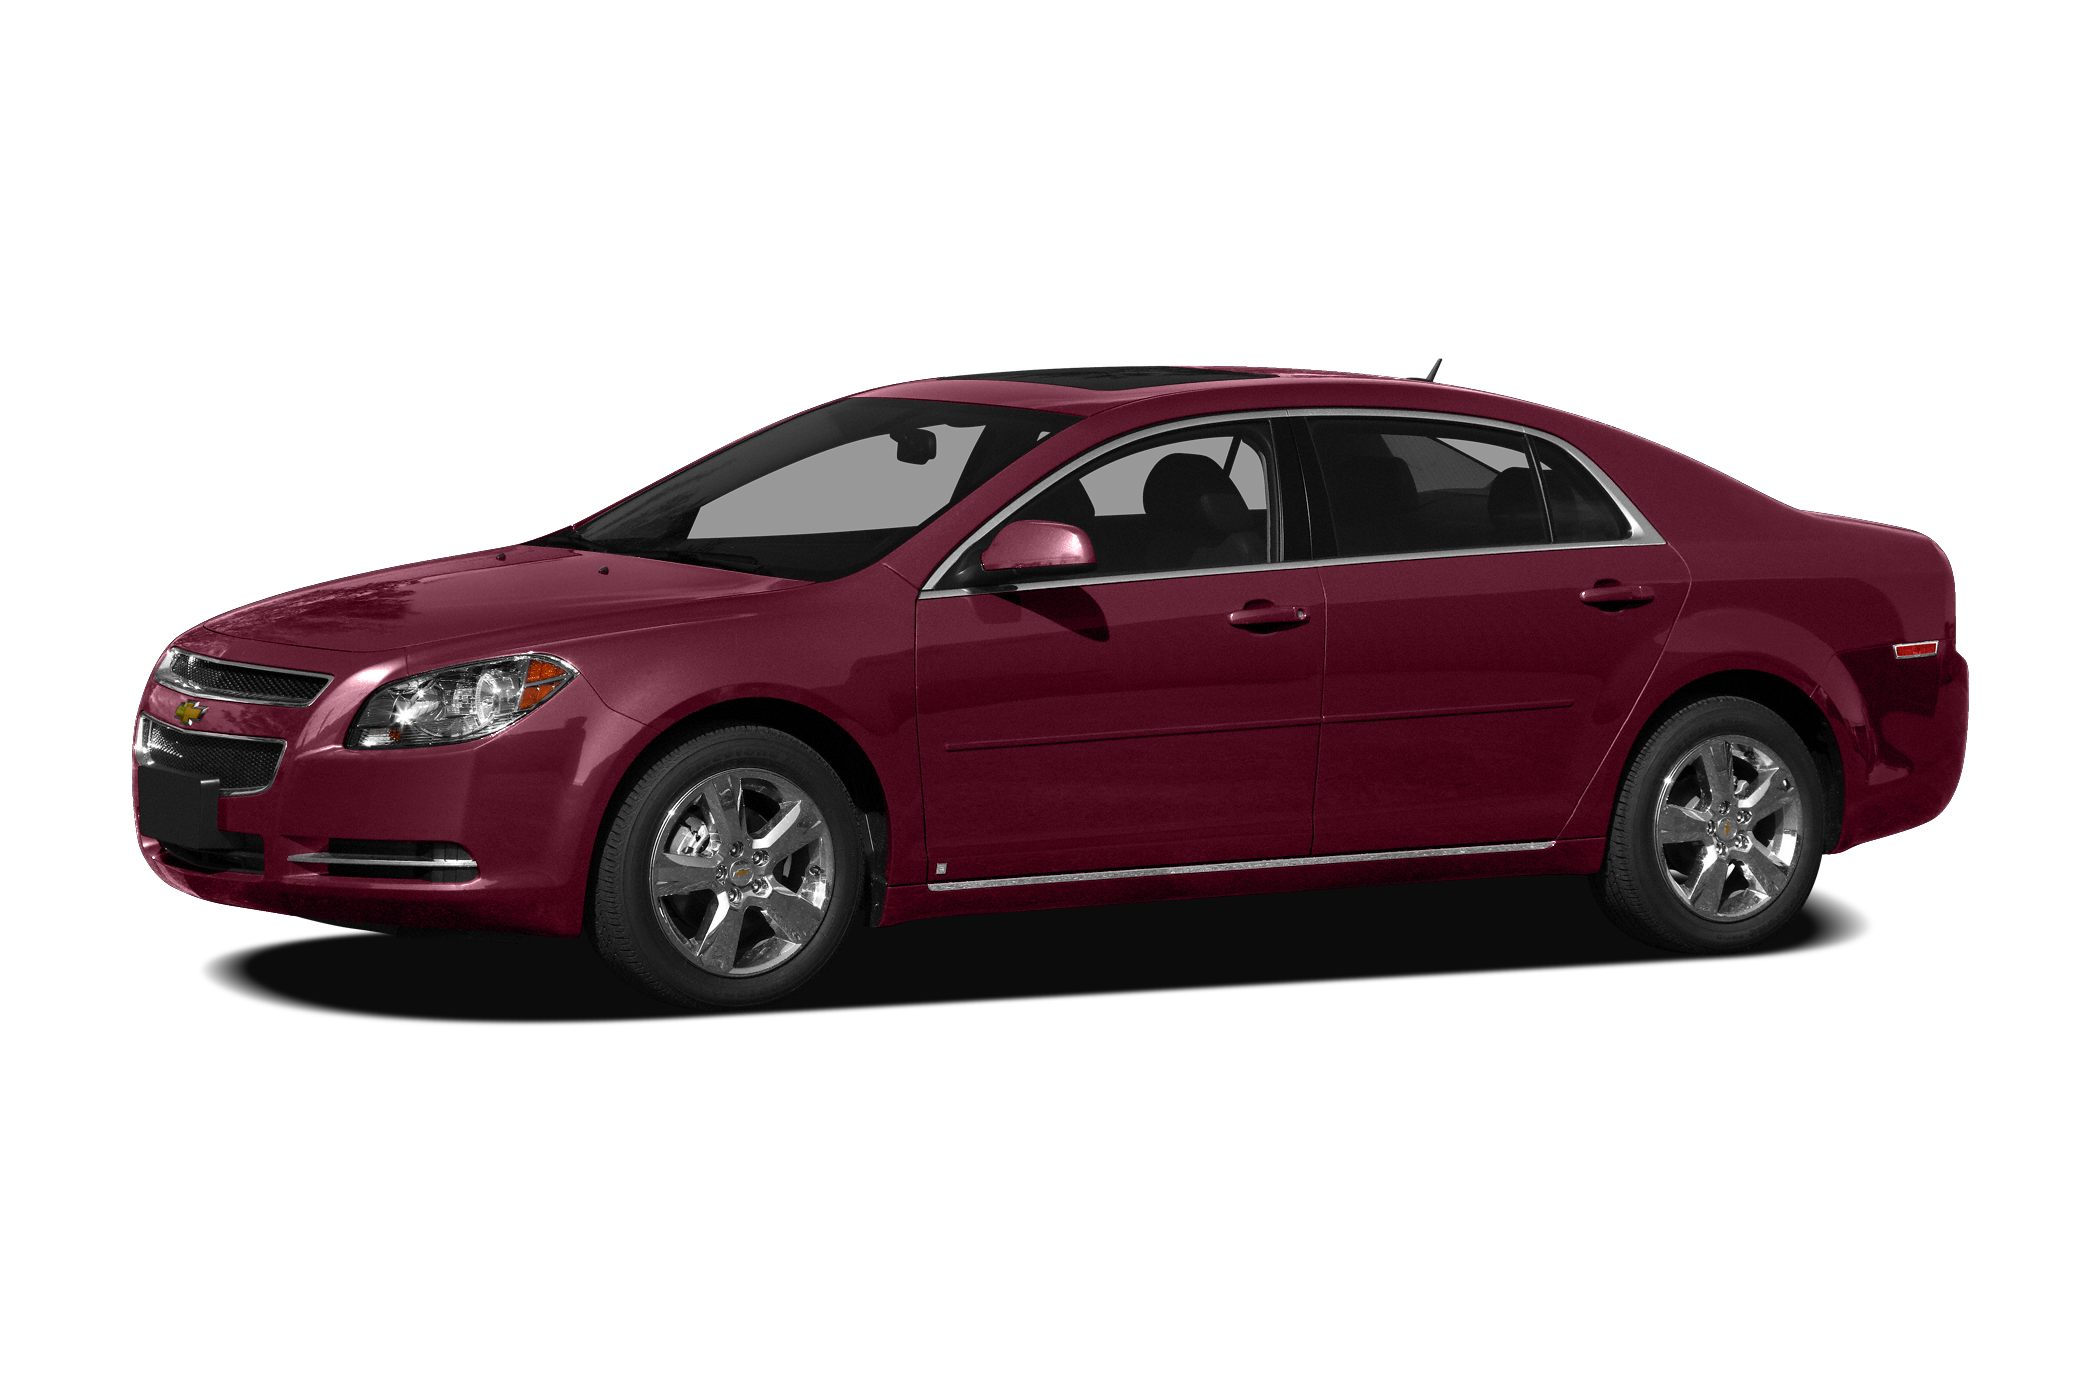 2010 Chevrolet Malibu Lt W 1lt 4dr Sedan Pricing And Options